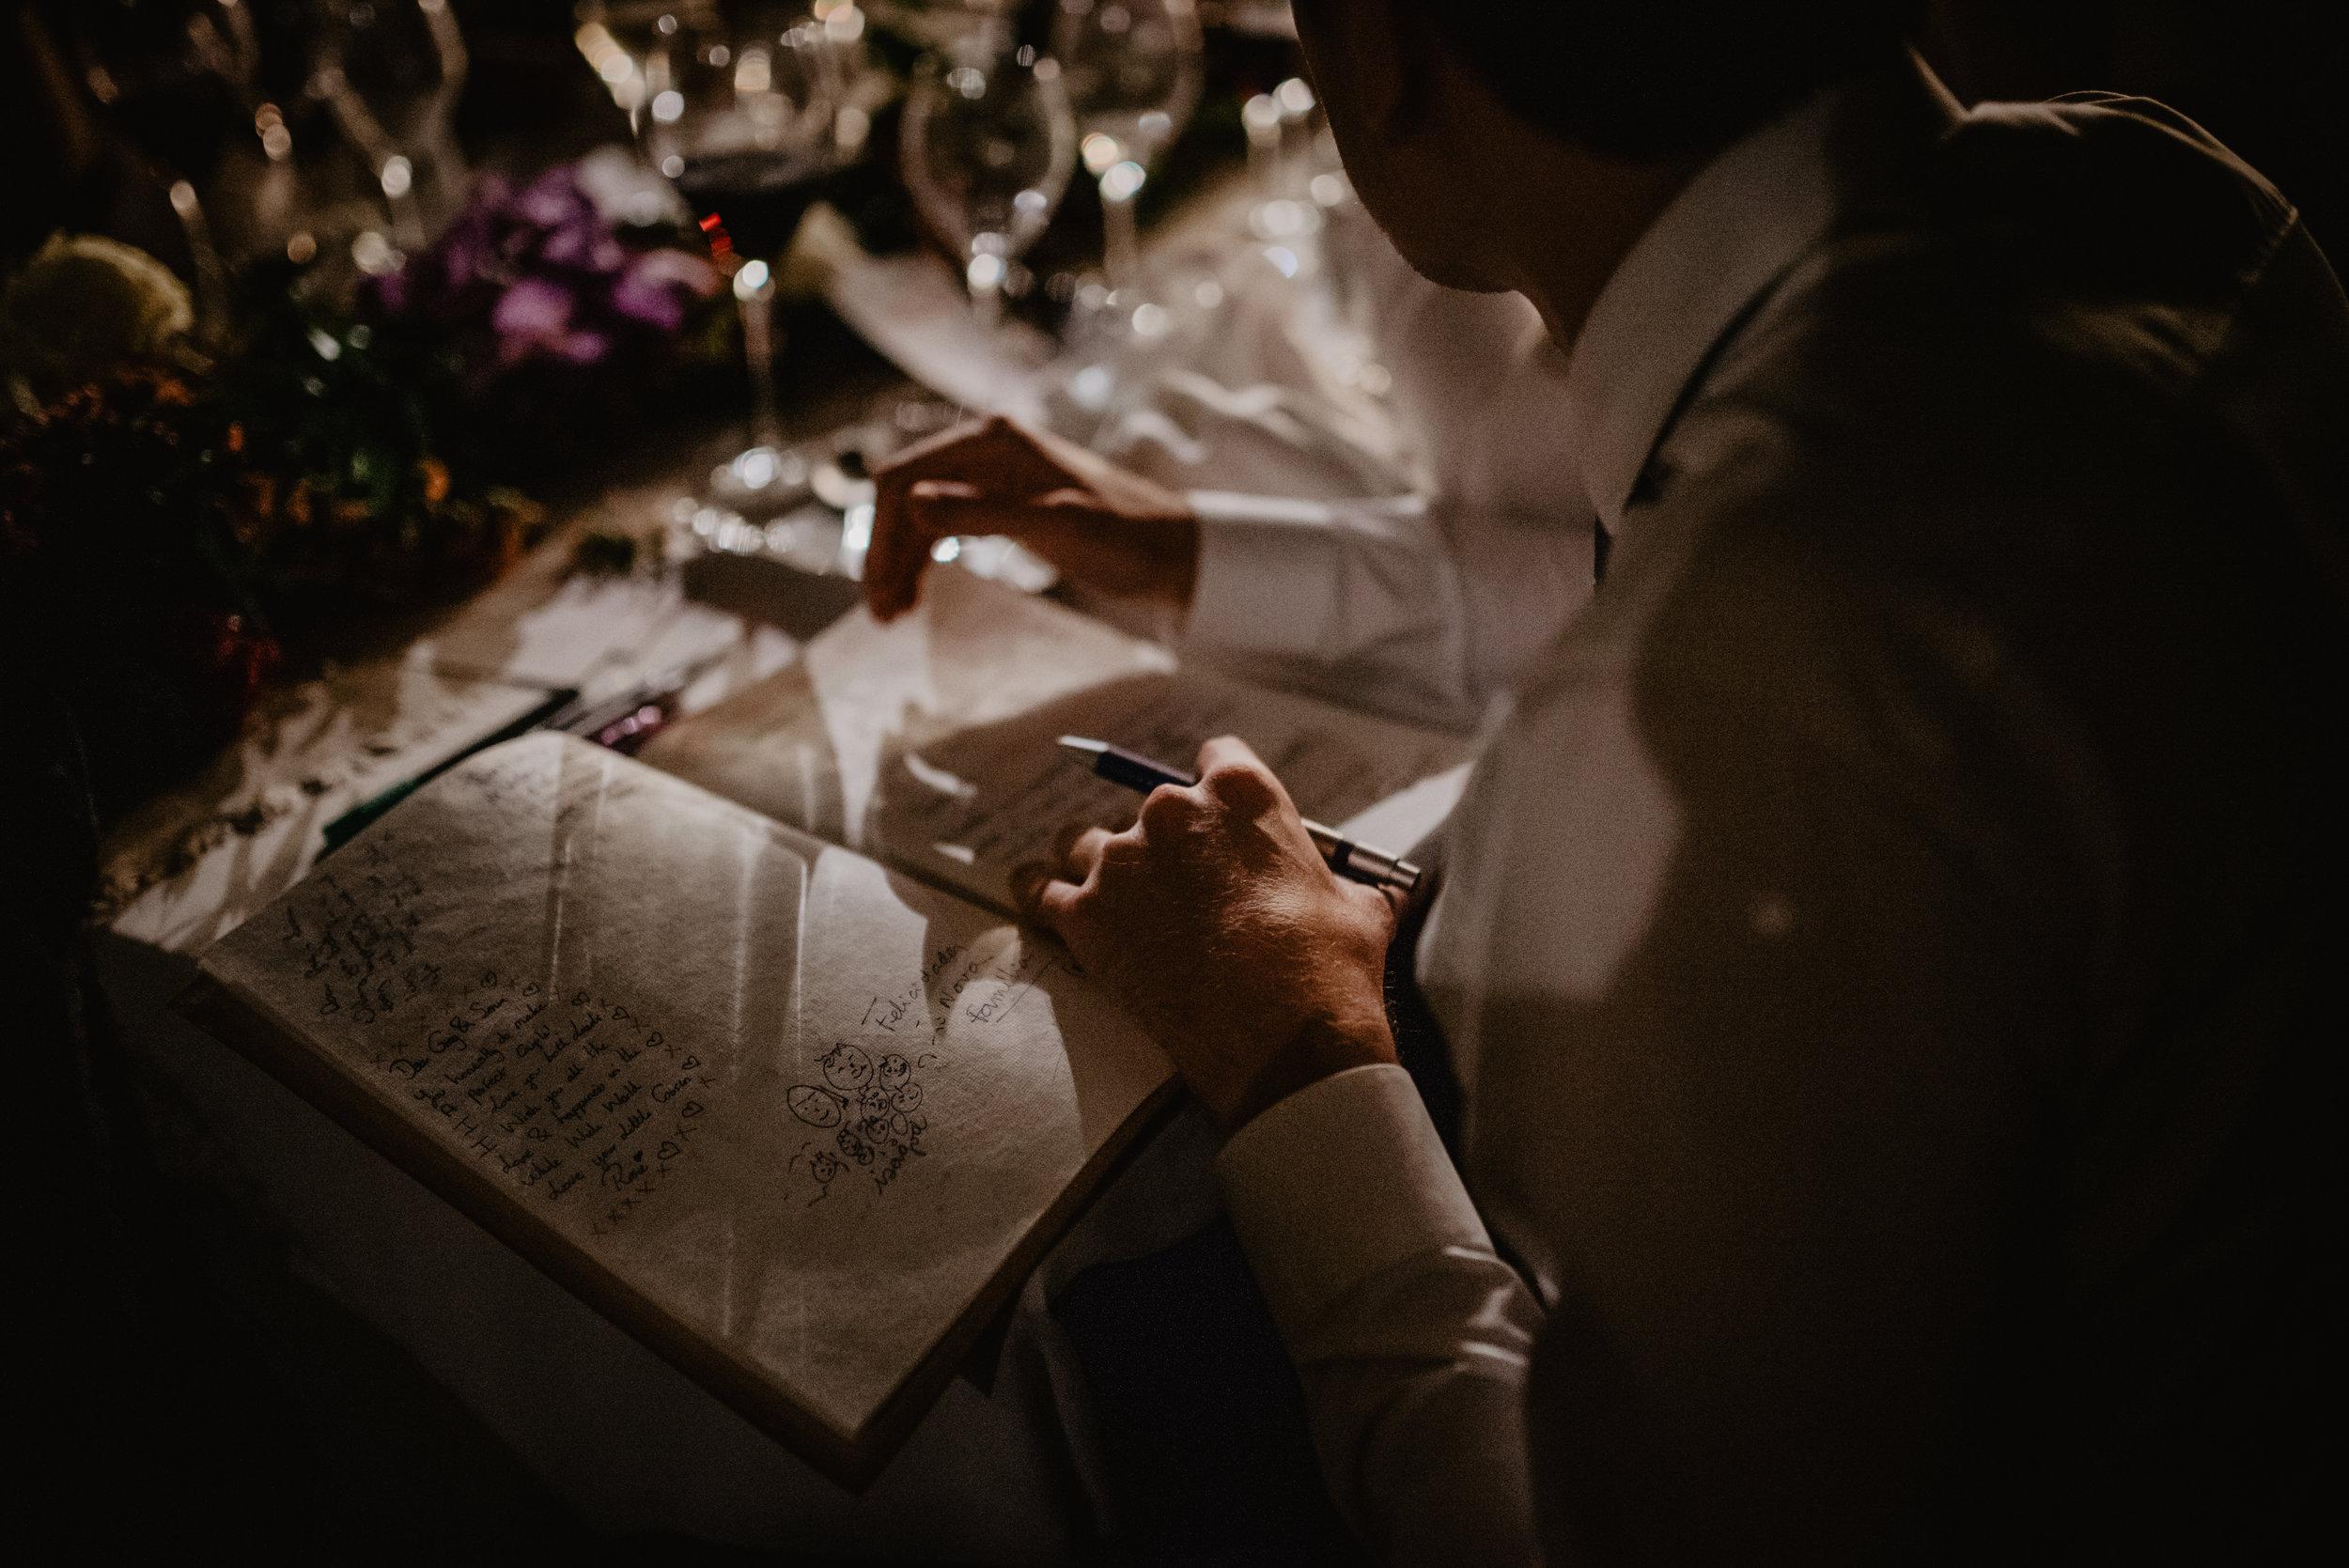 Lapela-photography-wedding-sintra-portugal-124.jpg